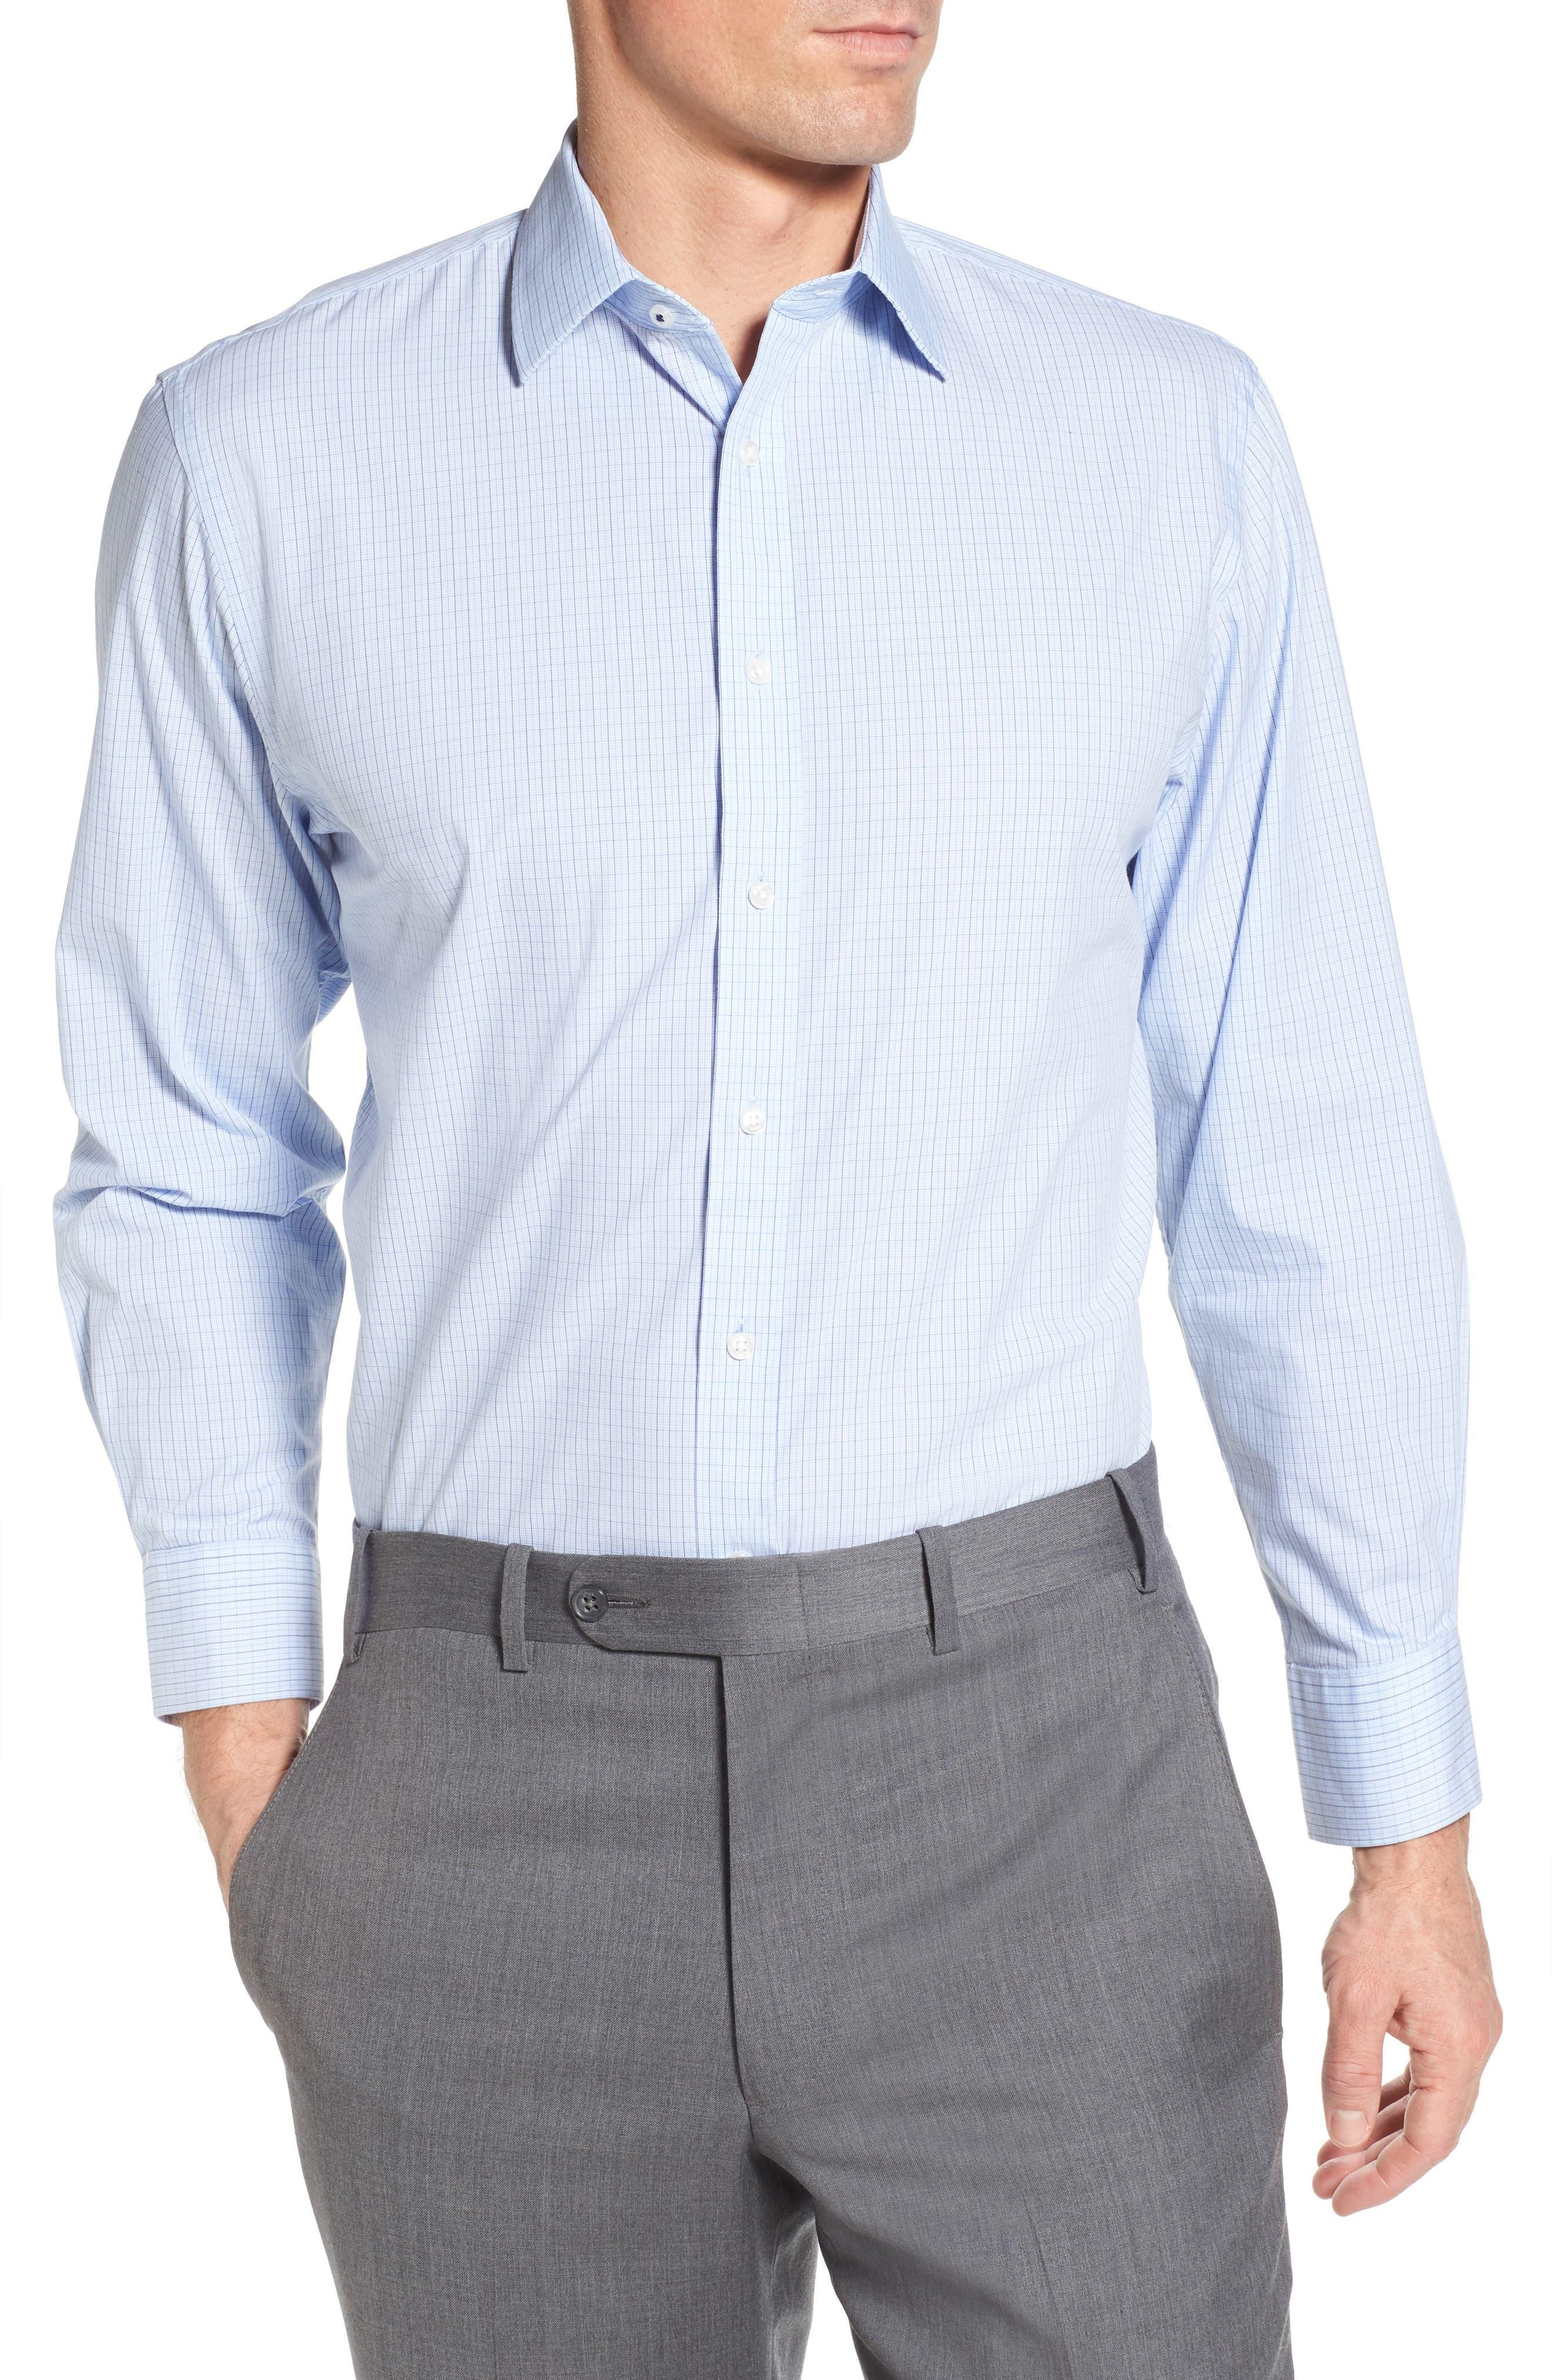 Alternate Image 1 Selected - Nordstrom Men's Shop Tech-Smart Traditional Fit Check Dress Shirt